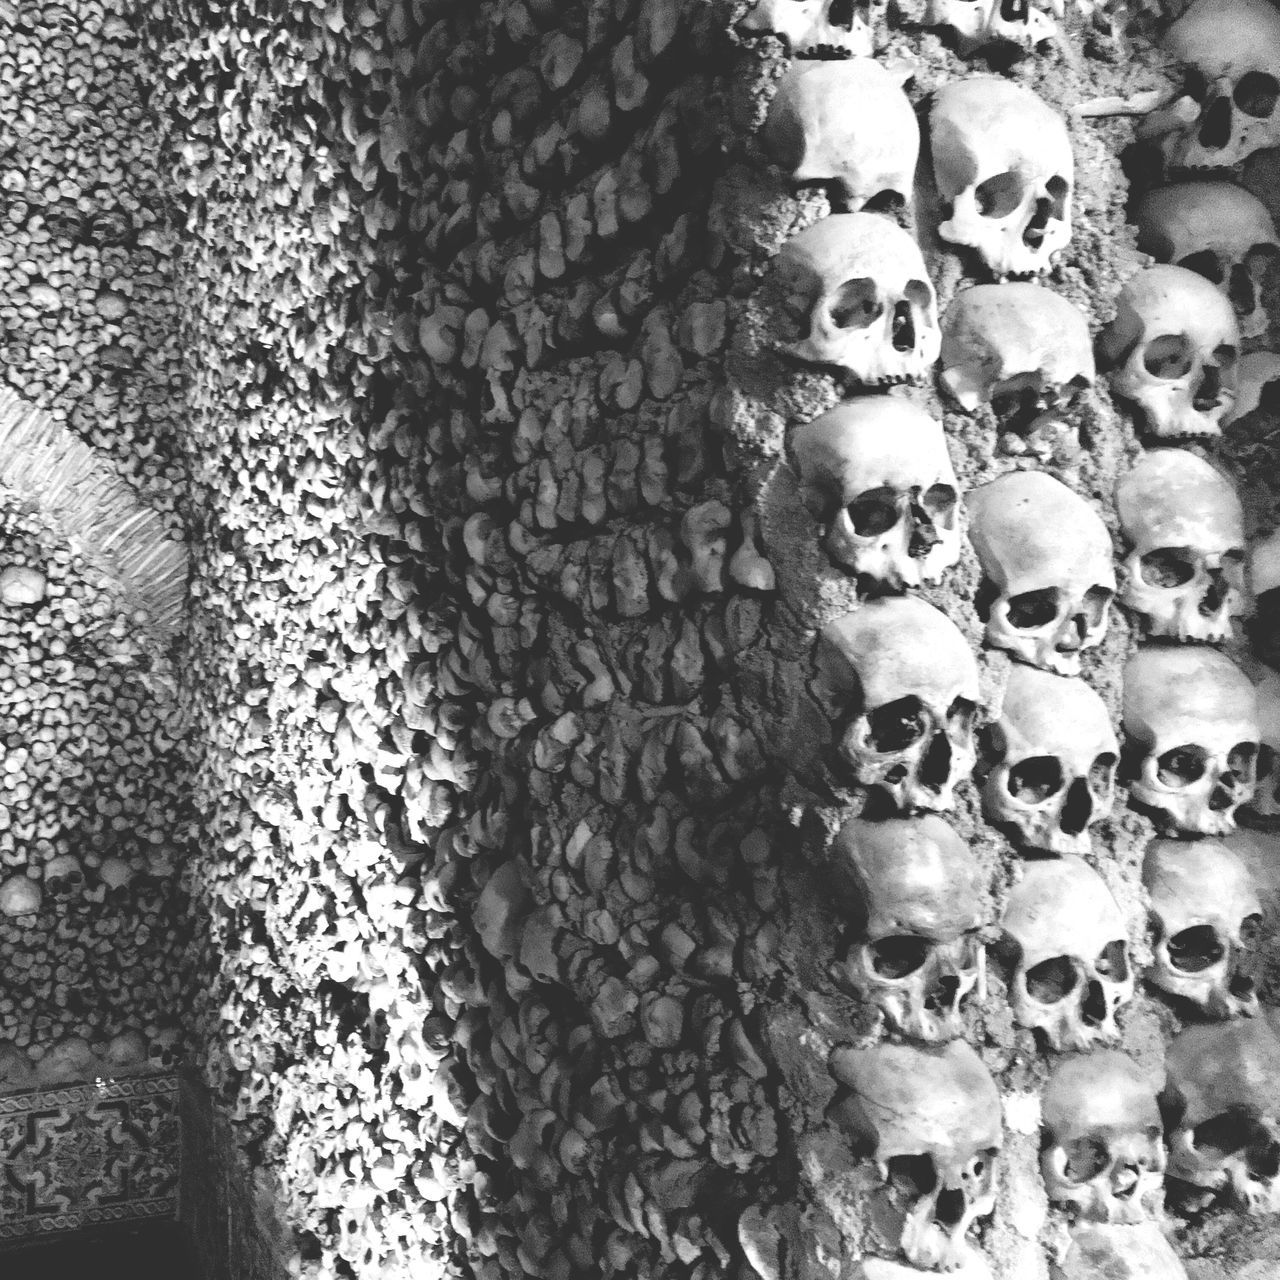 Bones Chapel (real human bones) No People Backgrounds Close-up Full Frame Textured  Day Indoors  Human Body Part Bones Bones Chapel Capela Dos Ossos Visit Alentejo Portugaldenorteasul Évora  Scary Real People Photooftheday Architecture Portraits Of EyeEm BYOPaper! The Architect - 2017 EyeEm Awards The Photojournalist - 2017 EyeEm Awards The Portraitist - 2017 EyeEm Awards EyeEmNewHere